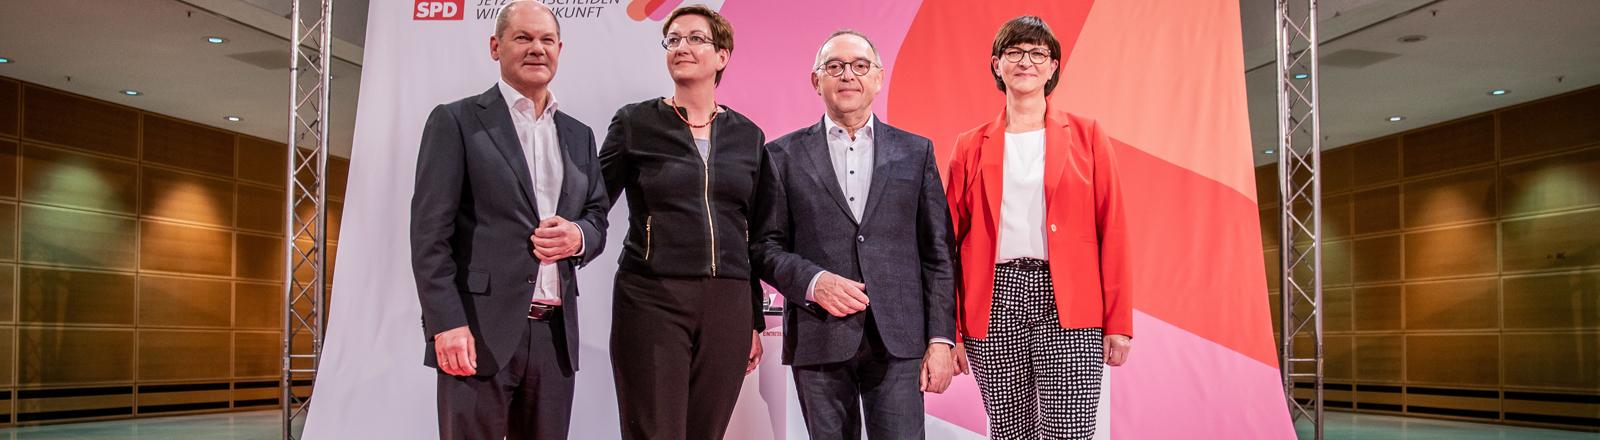 Olaf Scholz neben Klara Geywitz, Norbert Walter-Borjans und Saskia Esken